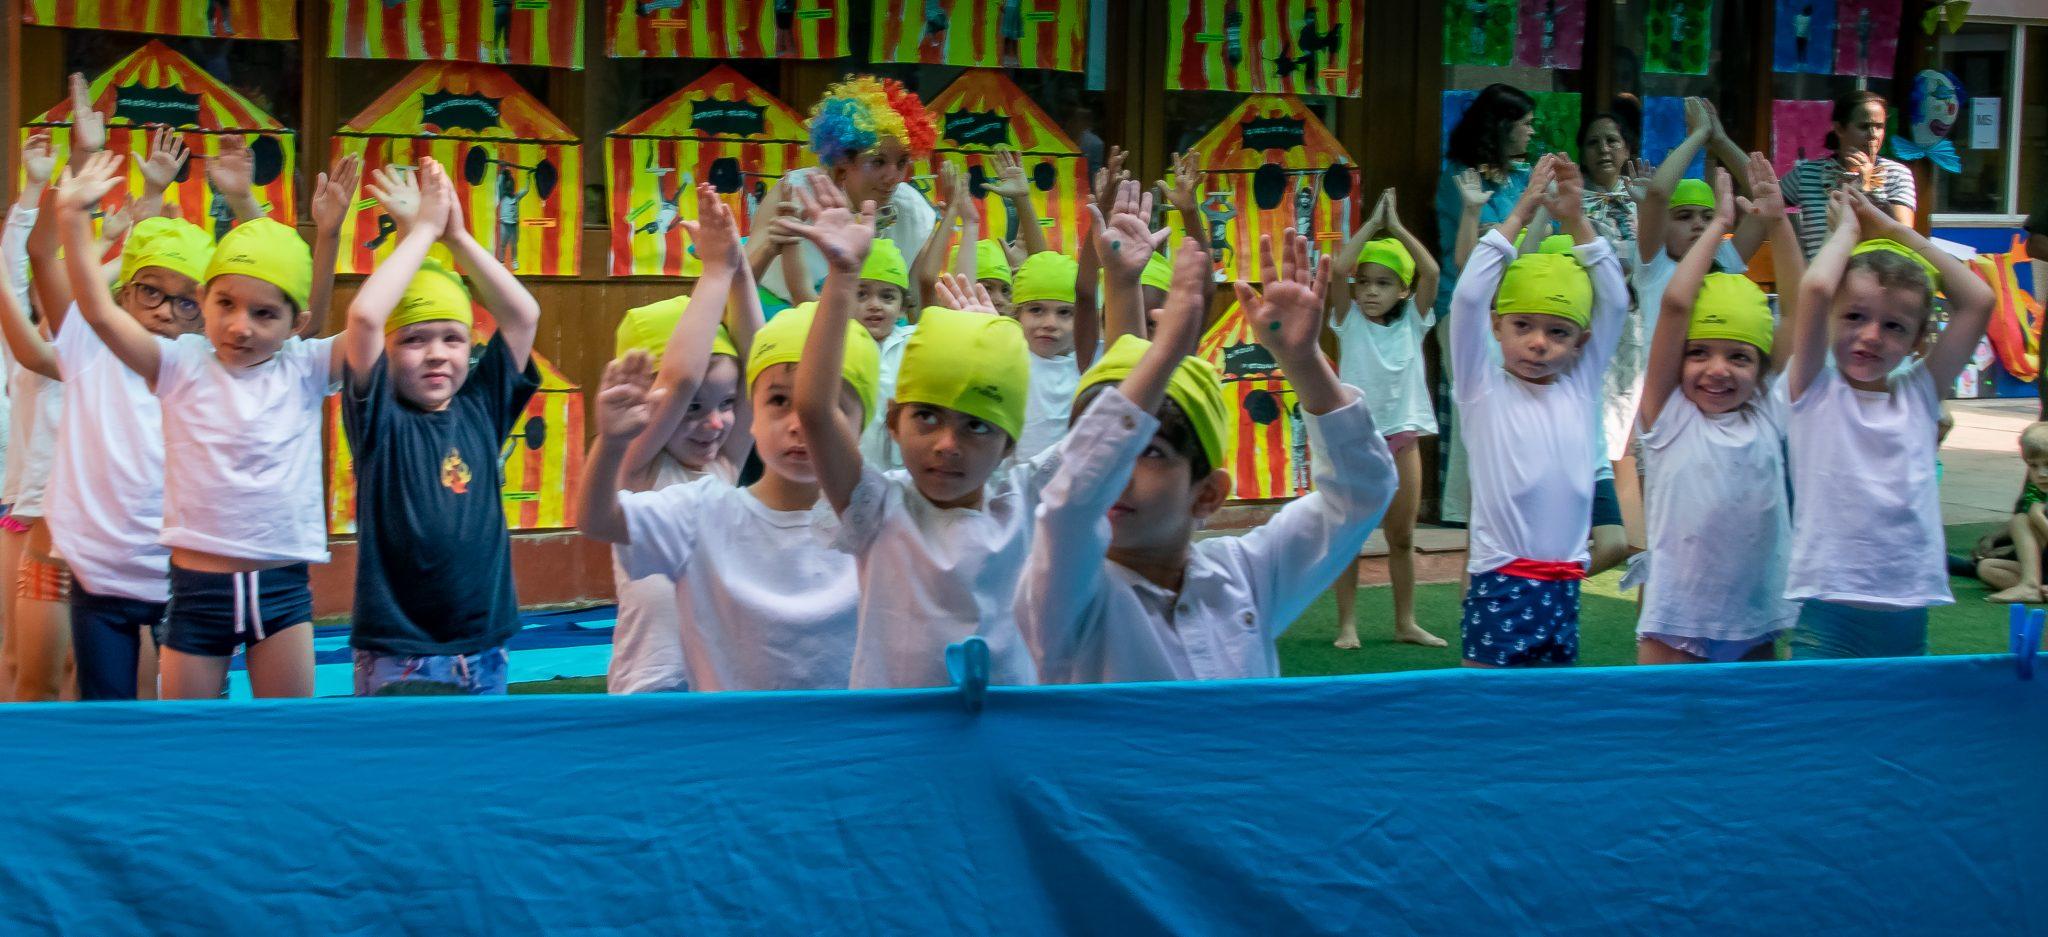 Circus! the Kinder Show